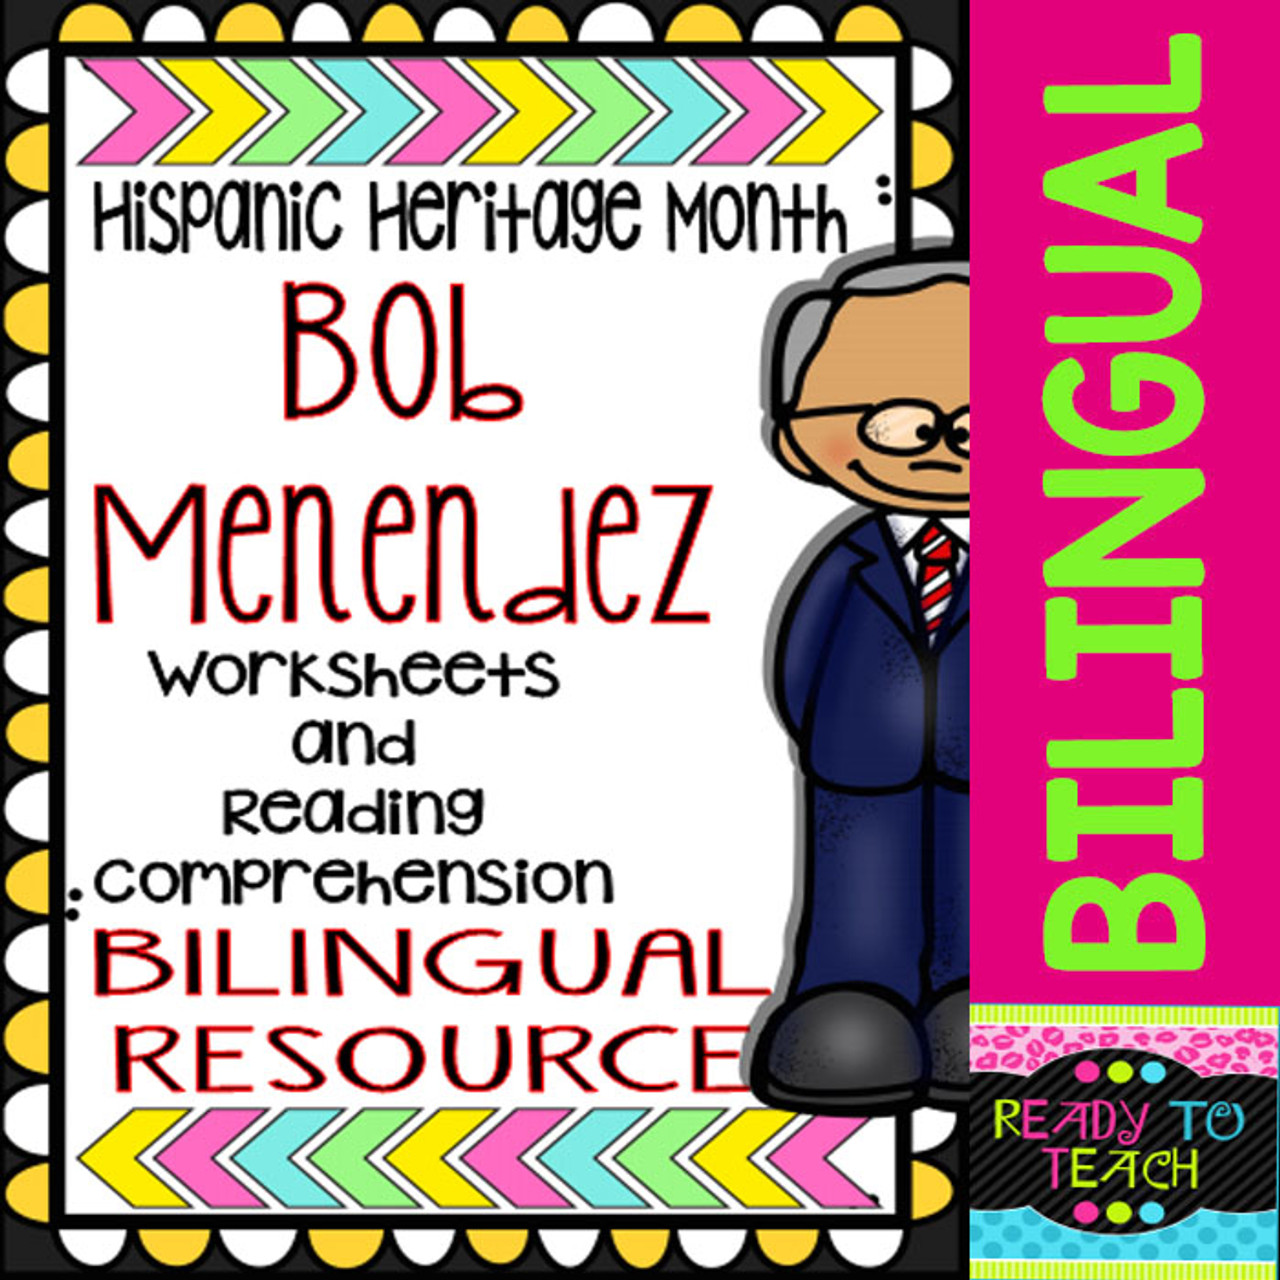 medium resolution of Hispanic Heritage Month - Bob Menendez - Worksheets and Readings (Bilingual)  - Amped Up Learning